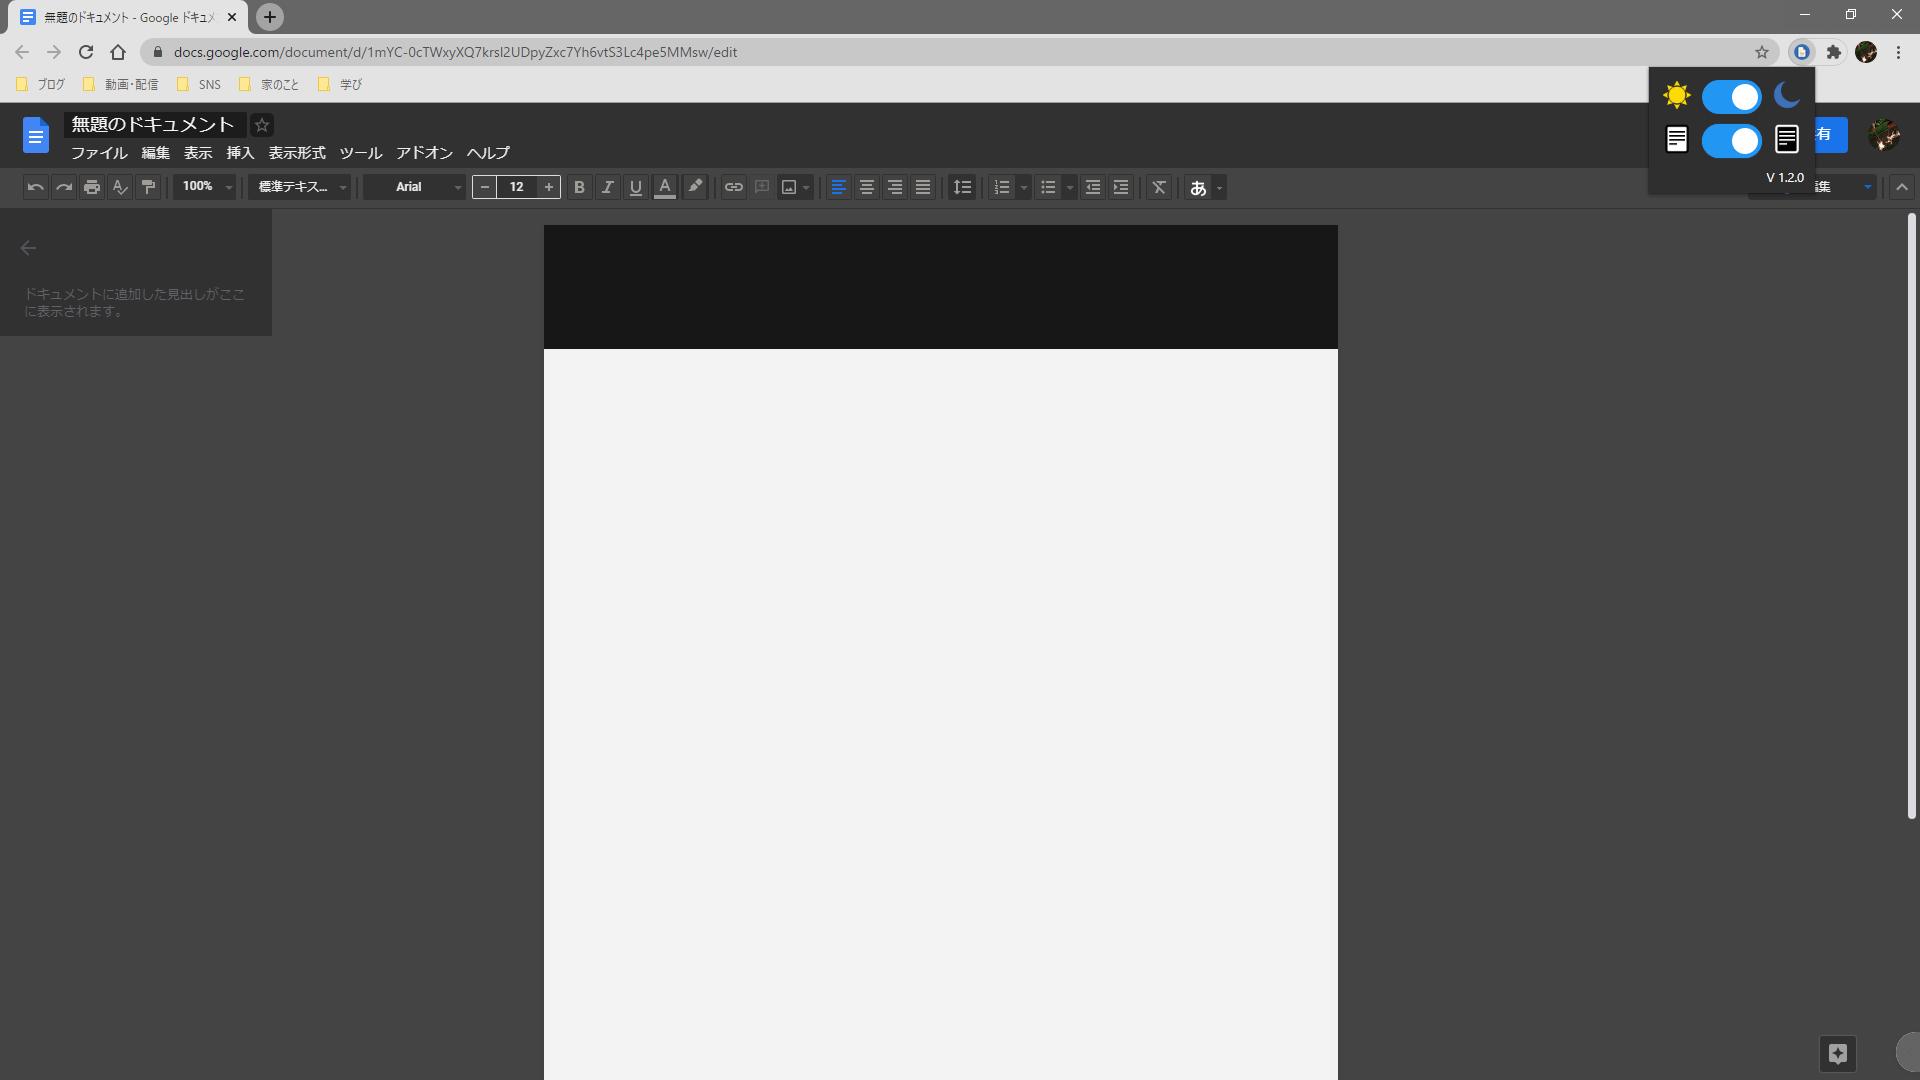 Google Docs Dark Modeを月(ダークテーマ)と黒(入力部分を黒)の両方設定した画像